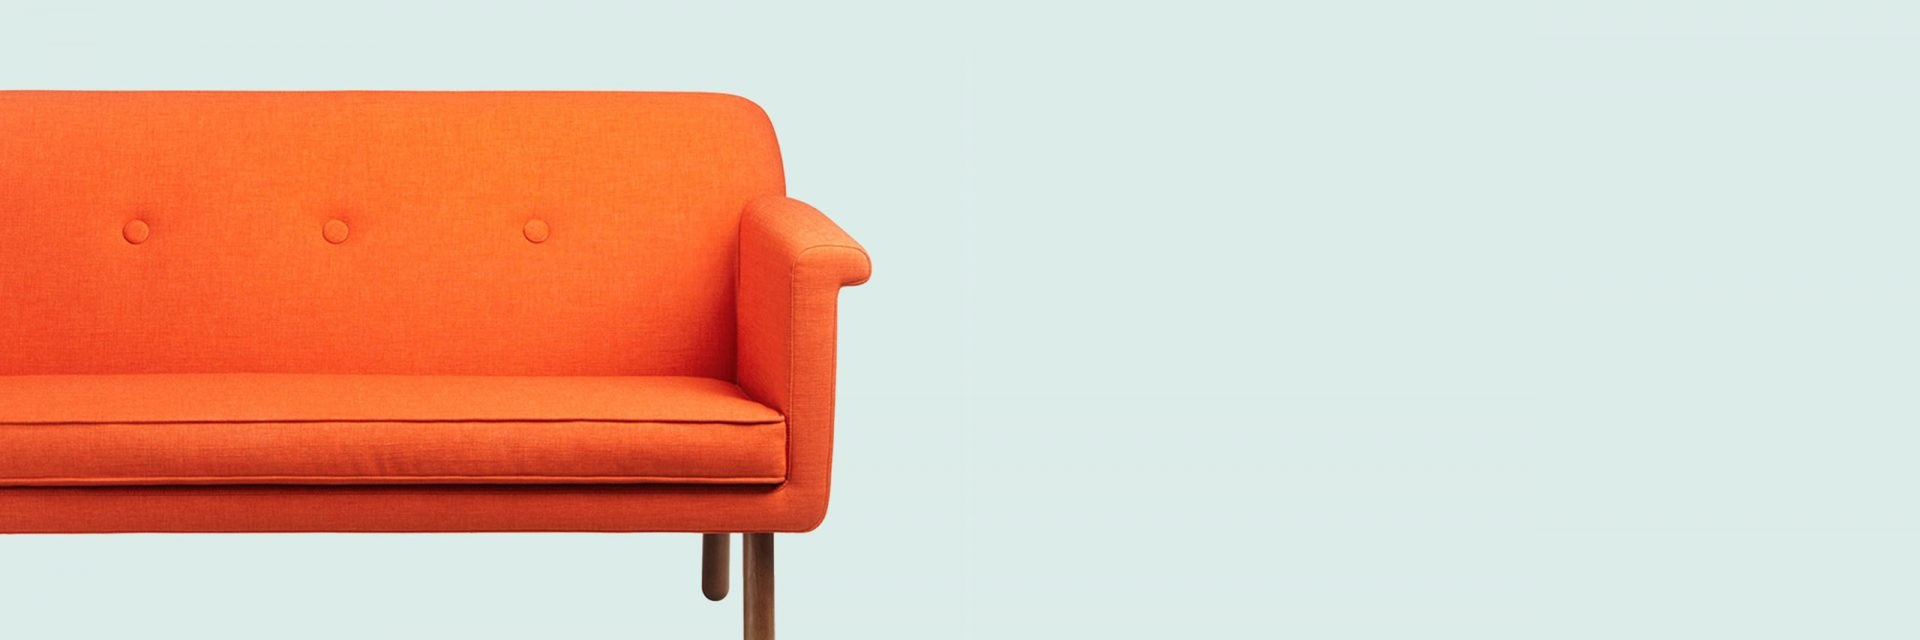 Orla Kiely Couch